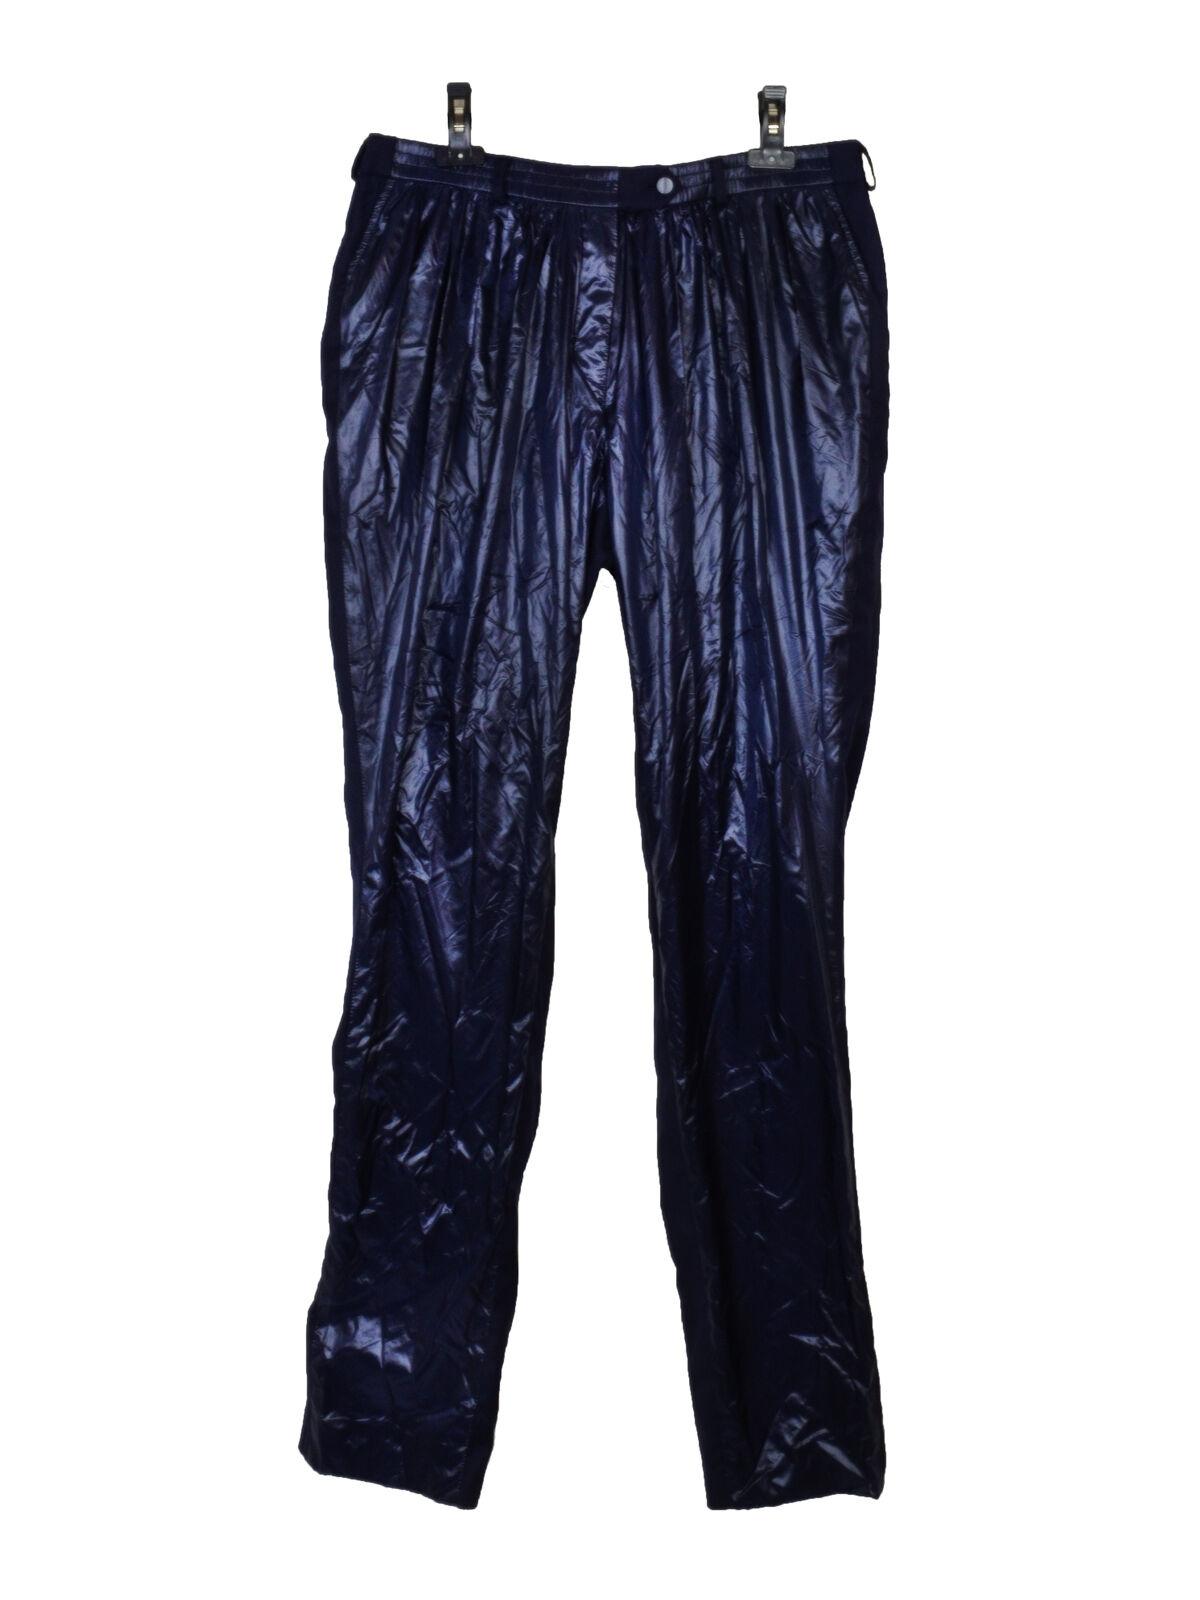 NEW Preen by Thornton Bregazzi bluee navy shiny trouser